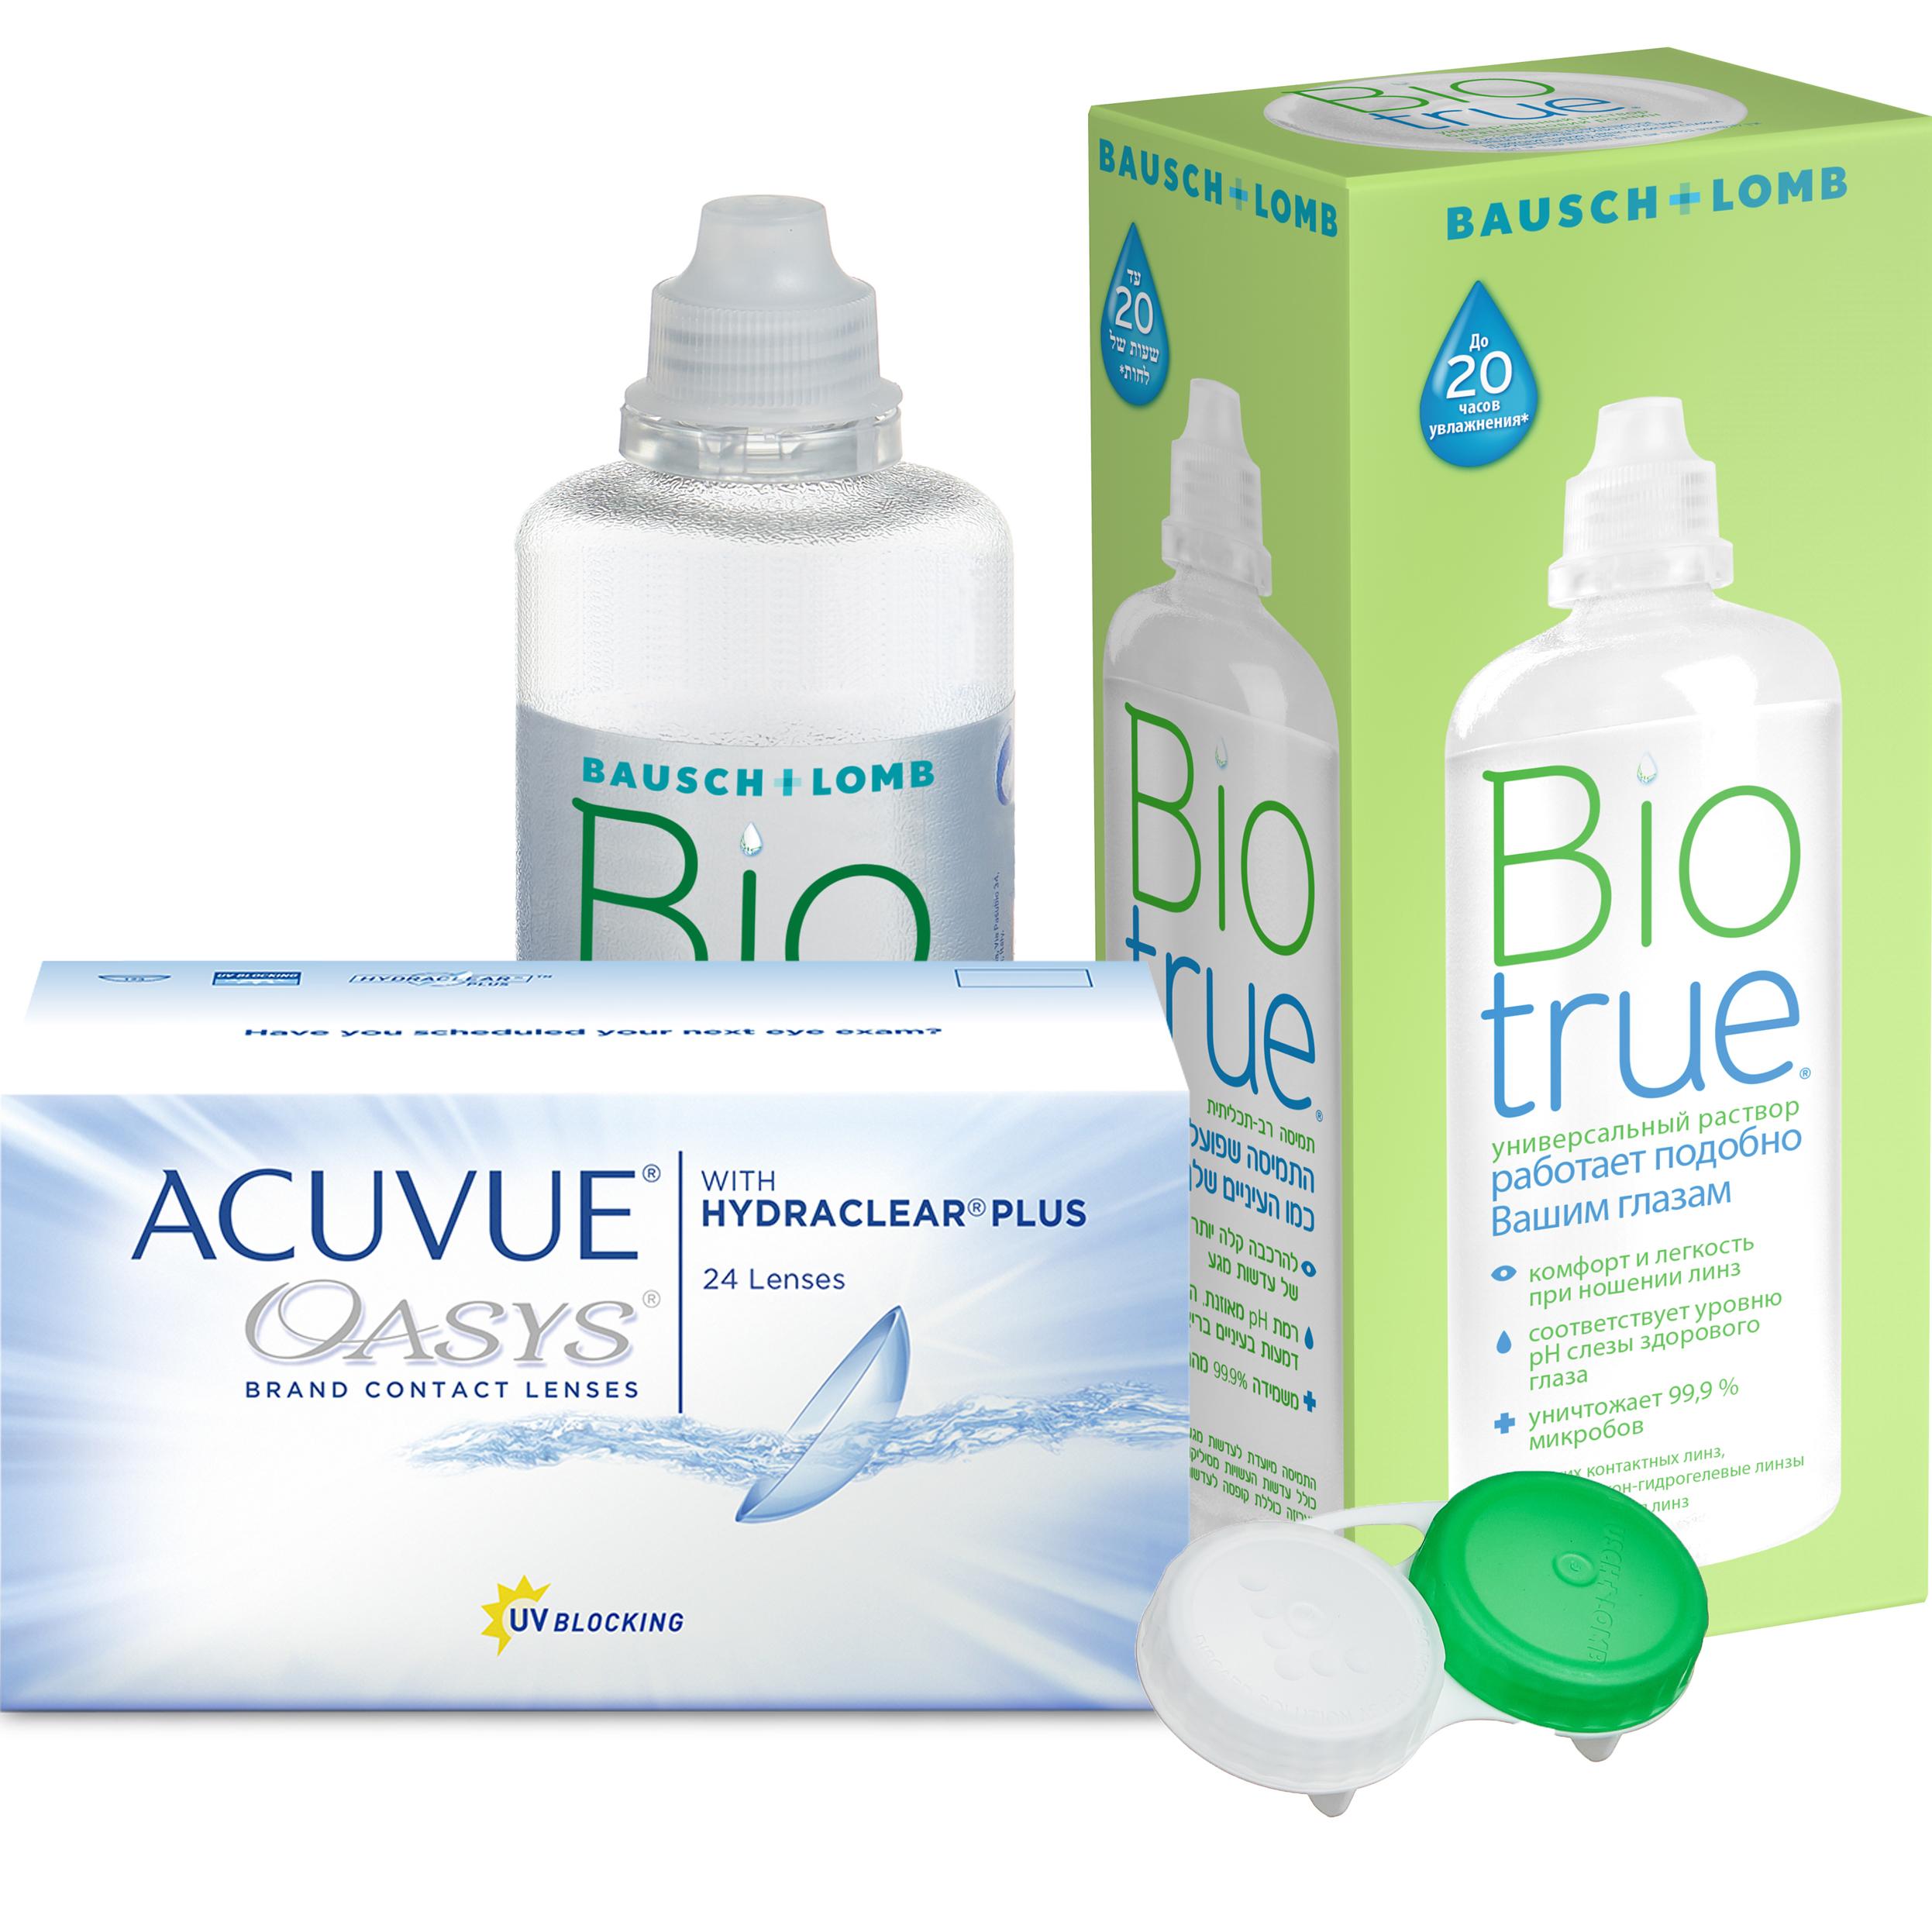 Купить Oasys with Hydraclear Plus 24 линзы + Biotrue, Контактные линзы Acuvue Oasys with Hydraclear Plus 24 линзы R 8.8 +3, 25 + Biotrue 300 мл